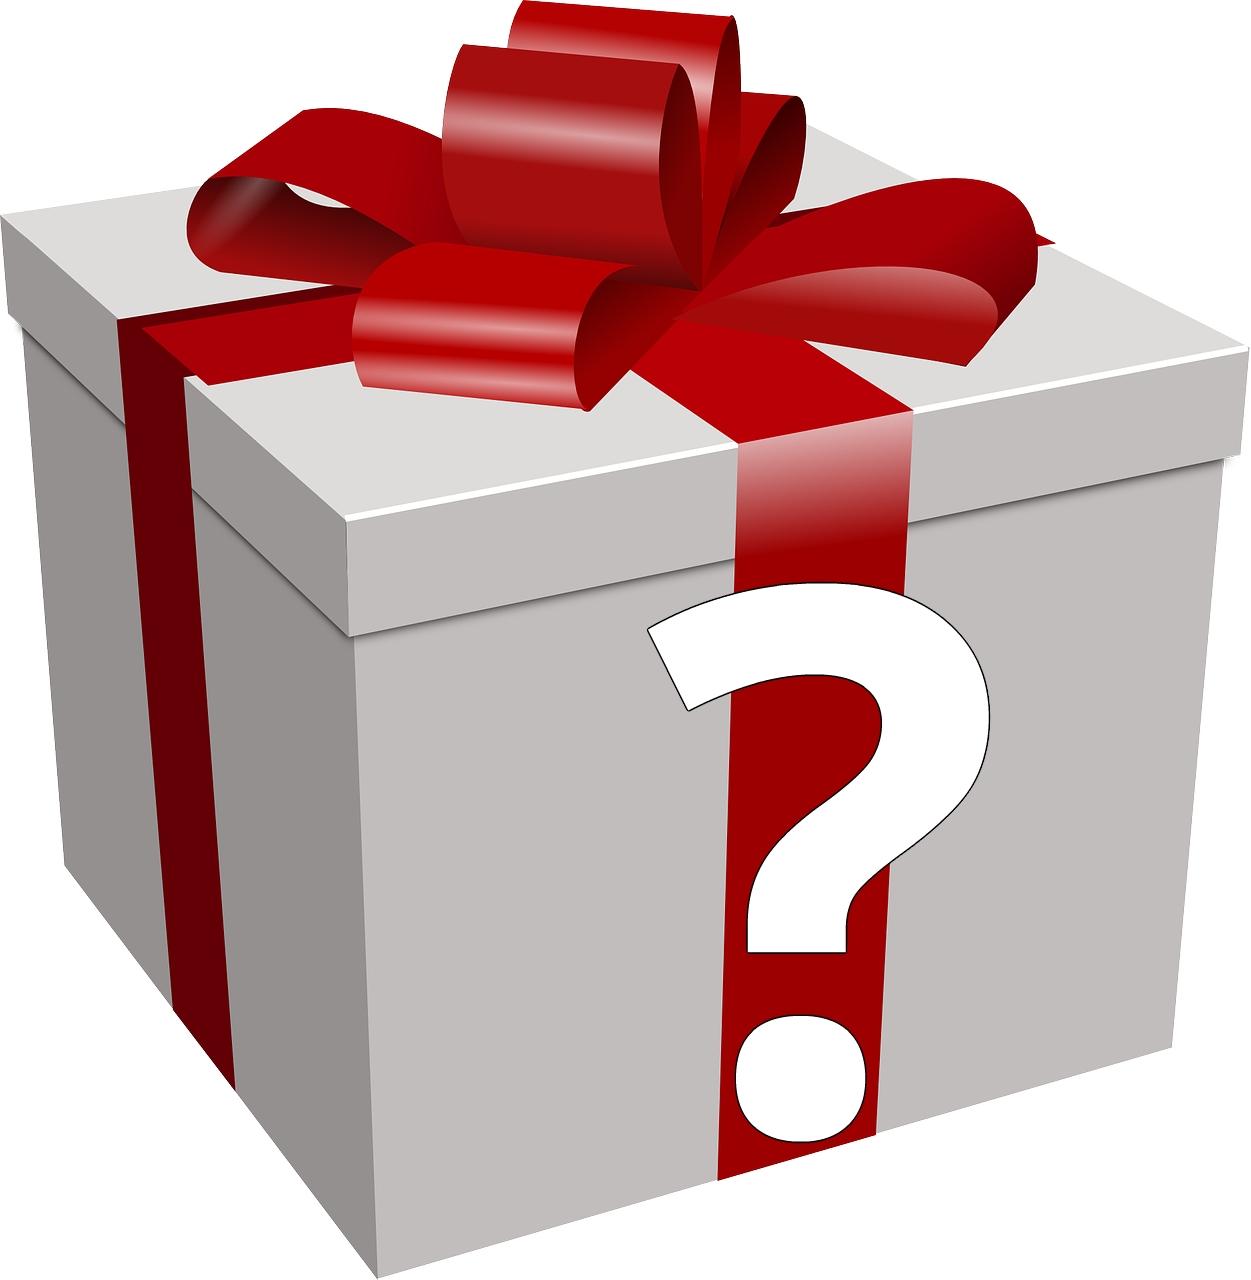 Mystery clipart mystery box #11